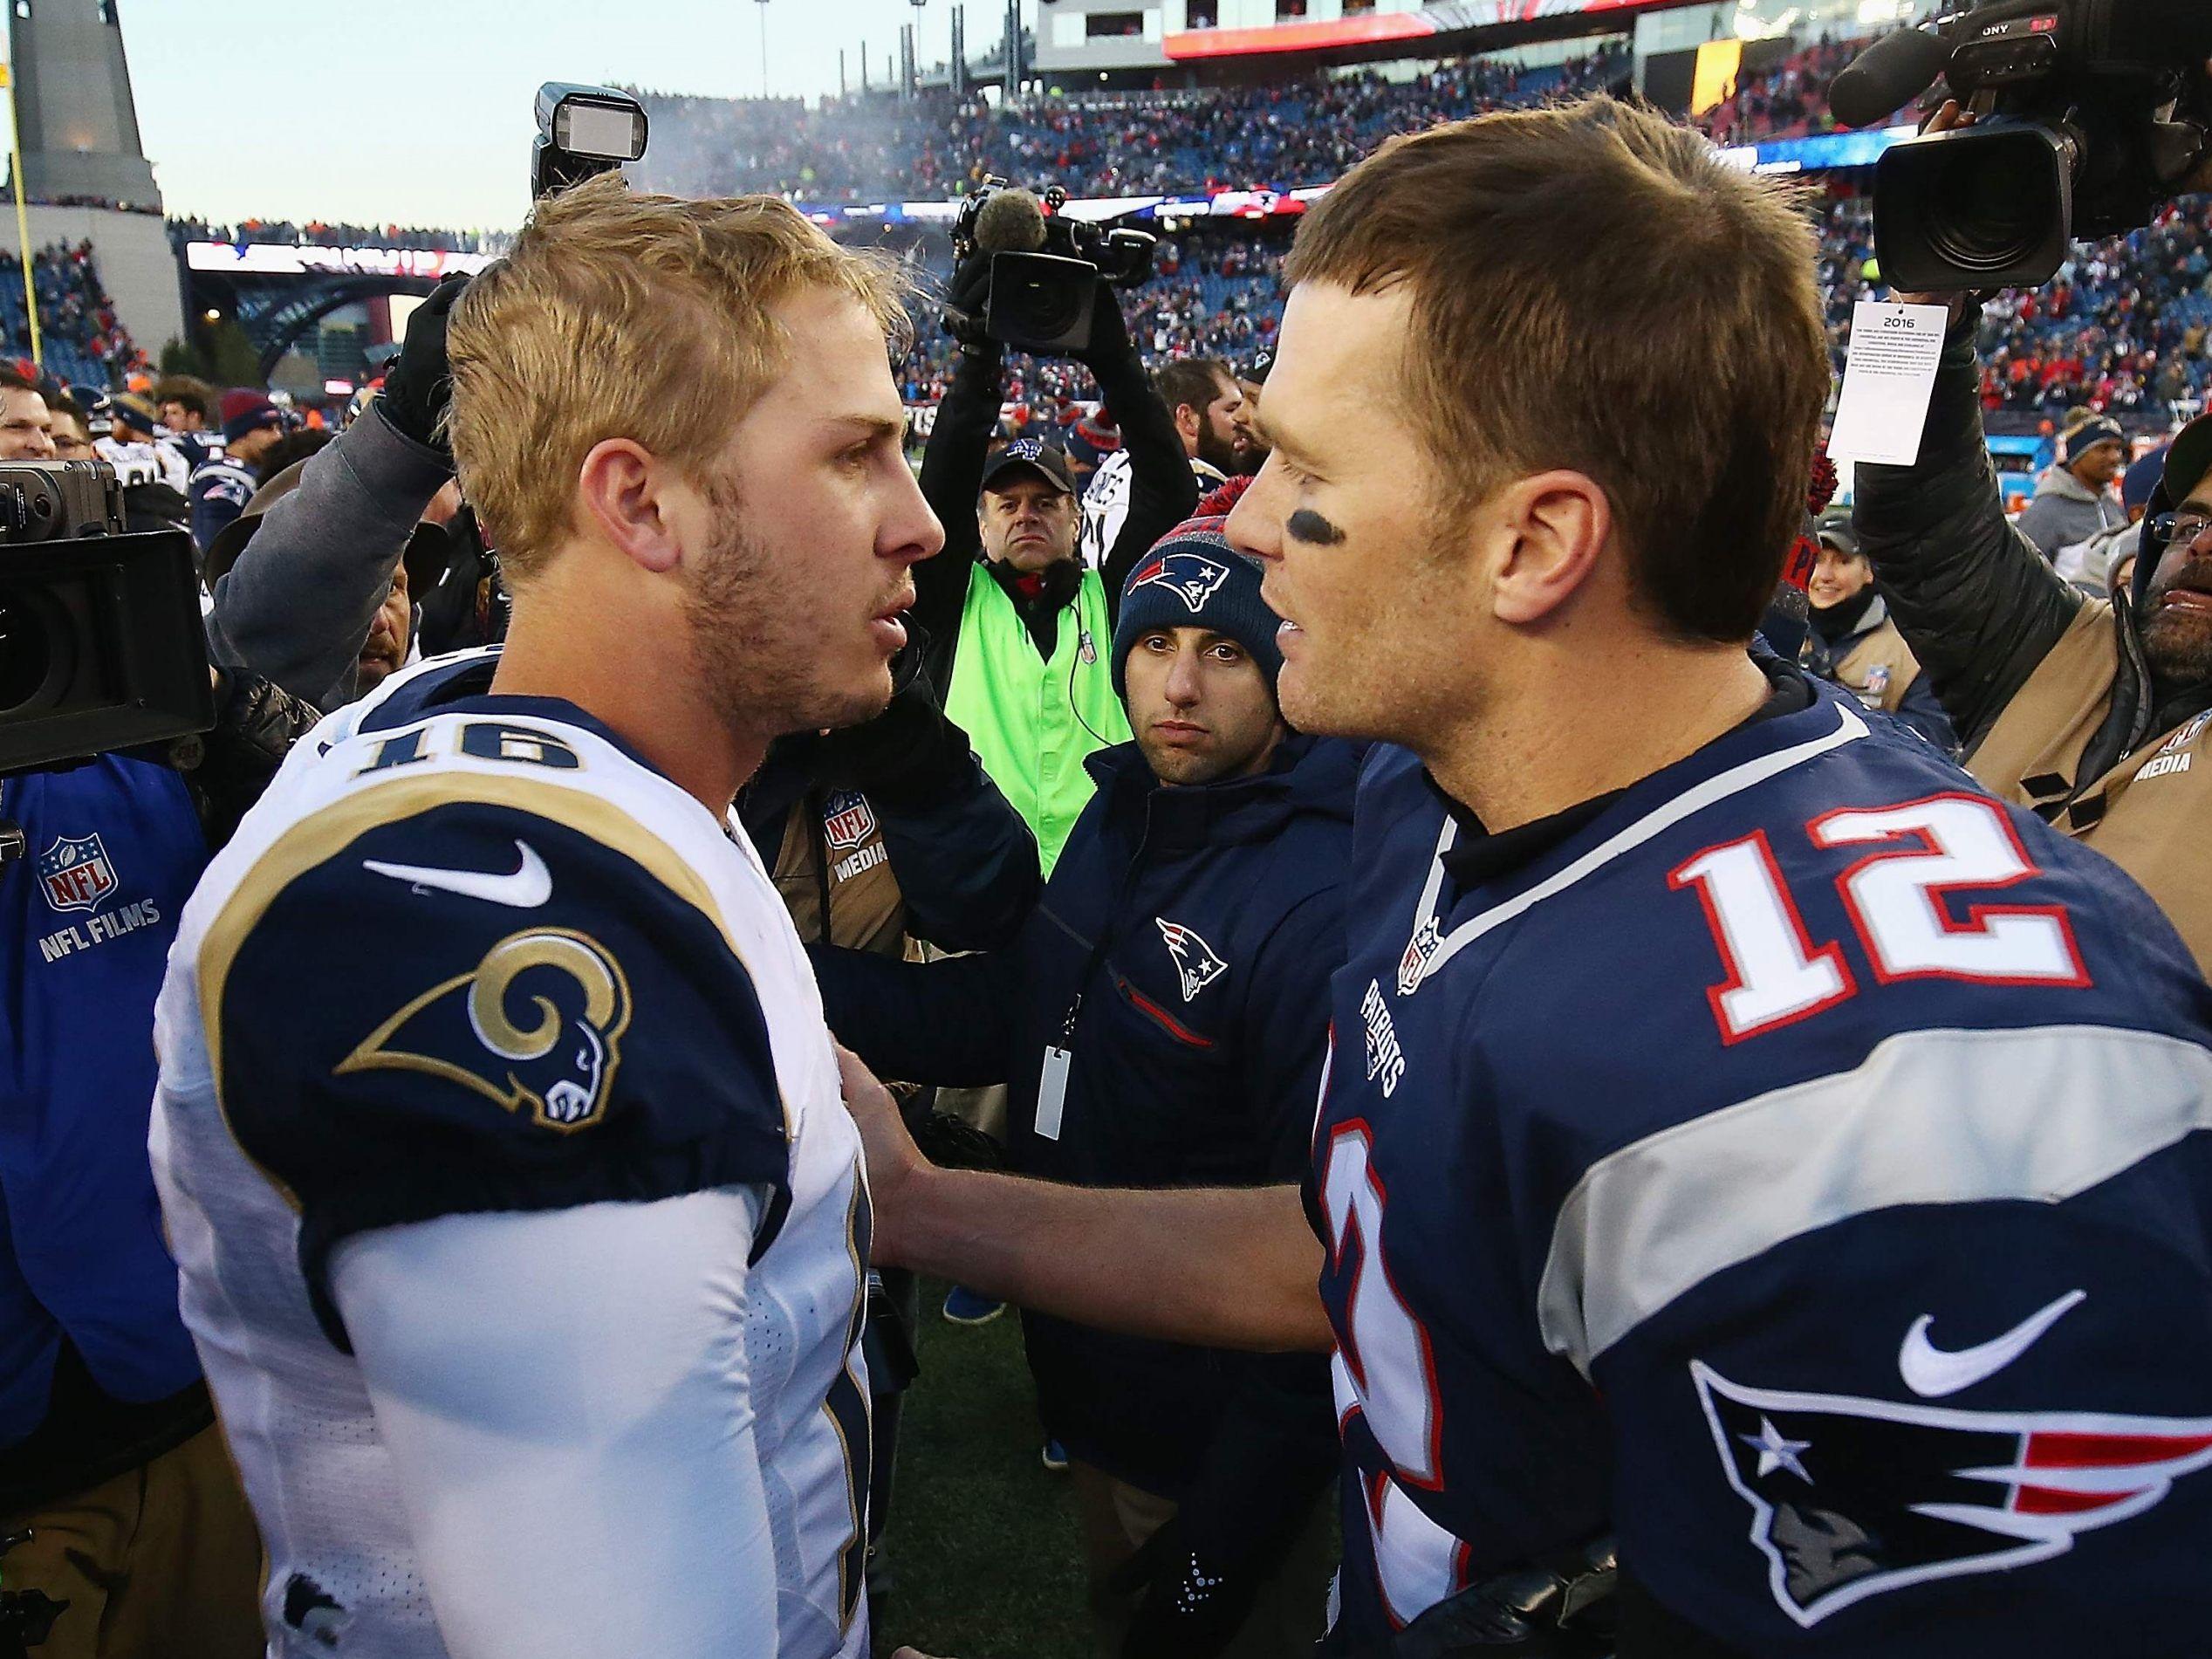 American Football: New England Patriots gewinnen Super Bowl